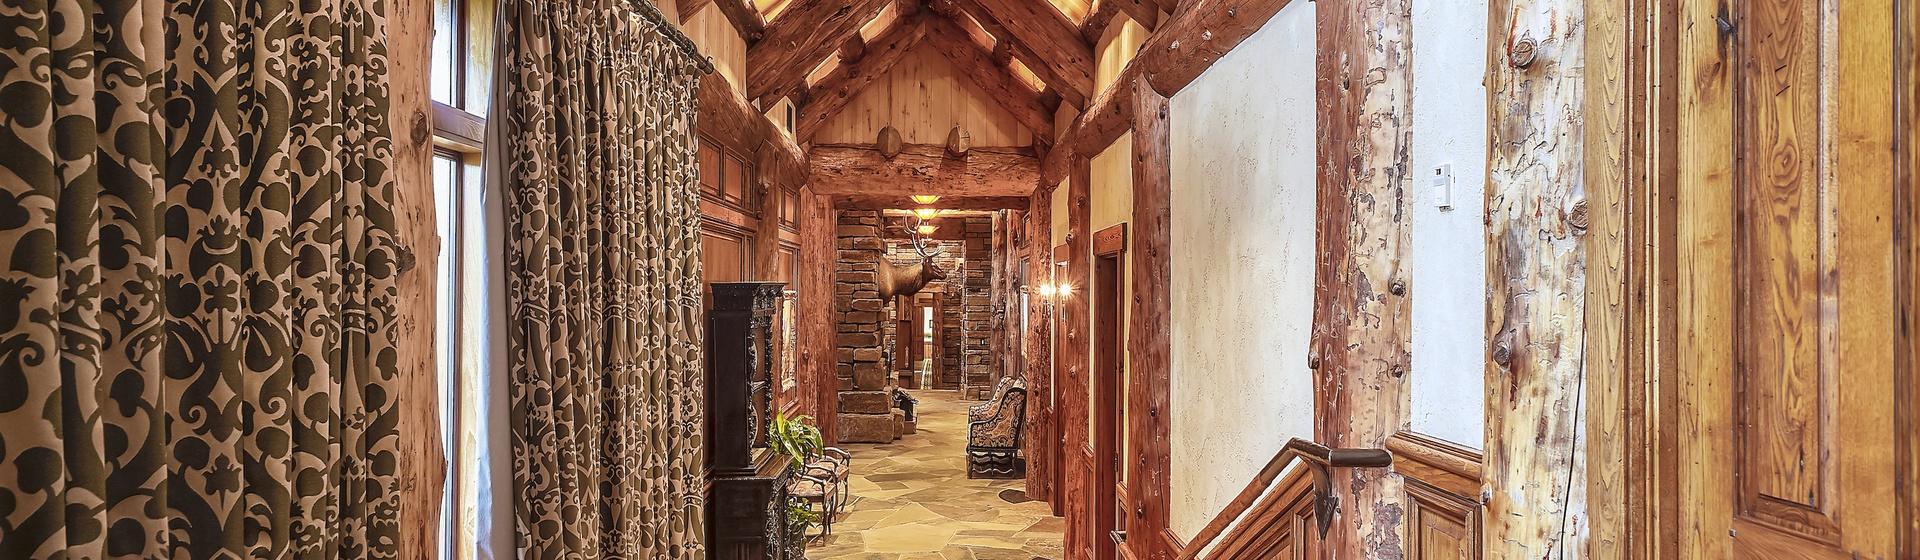 3.5-Telluride-Sleeping-Indian-Ranch-main-floor-gallery-hall-web.JPG